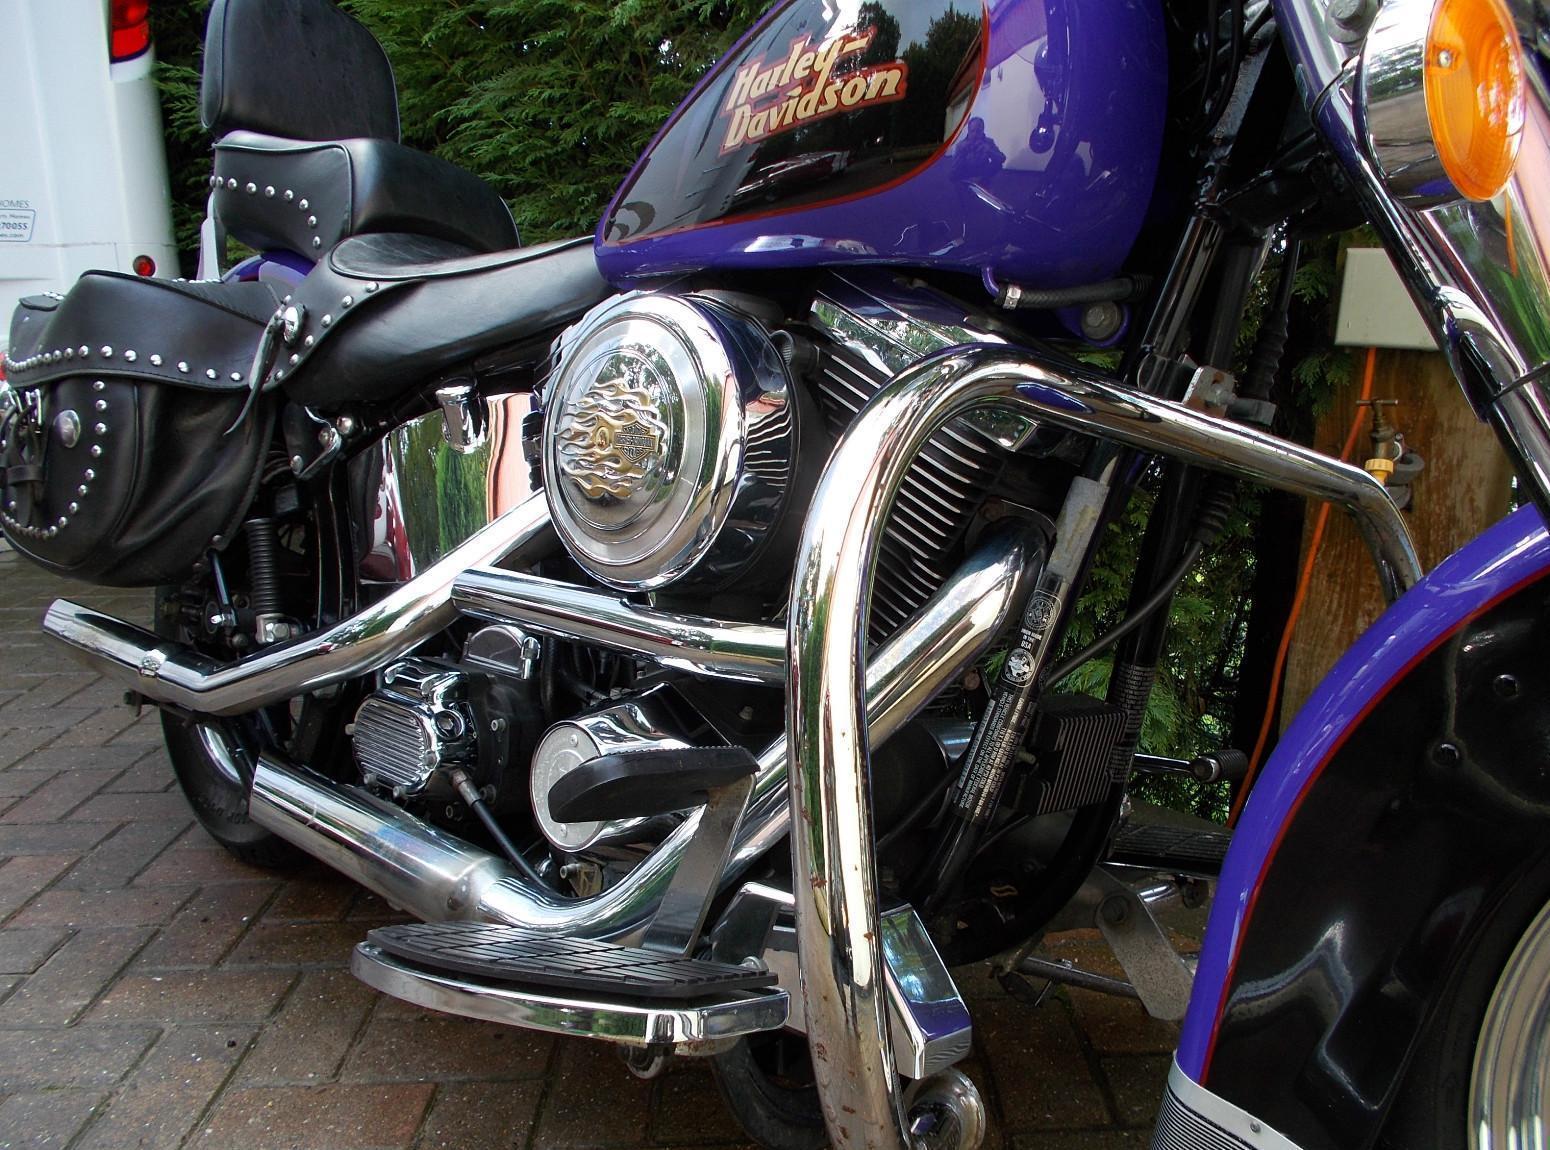 Heritage Harley-Davidson 2013 Colors